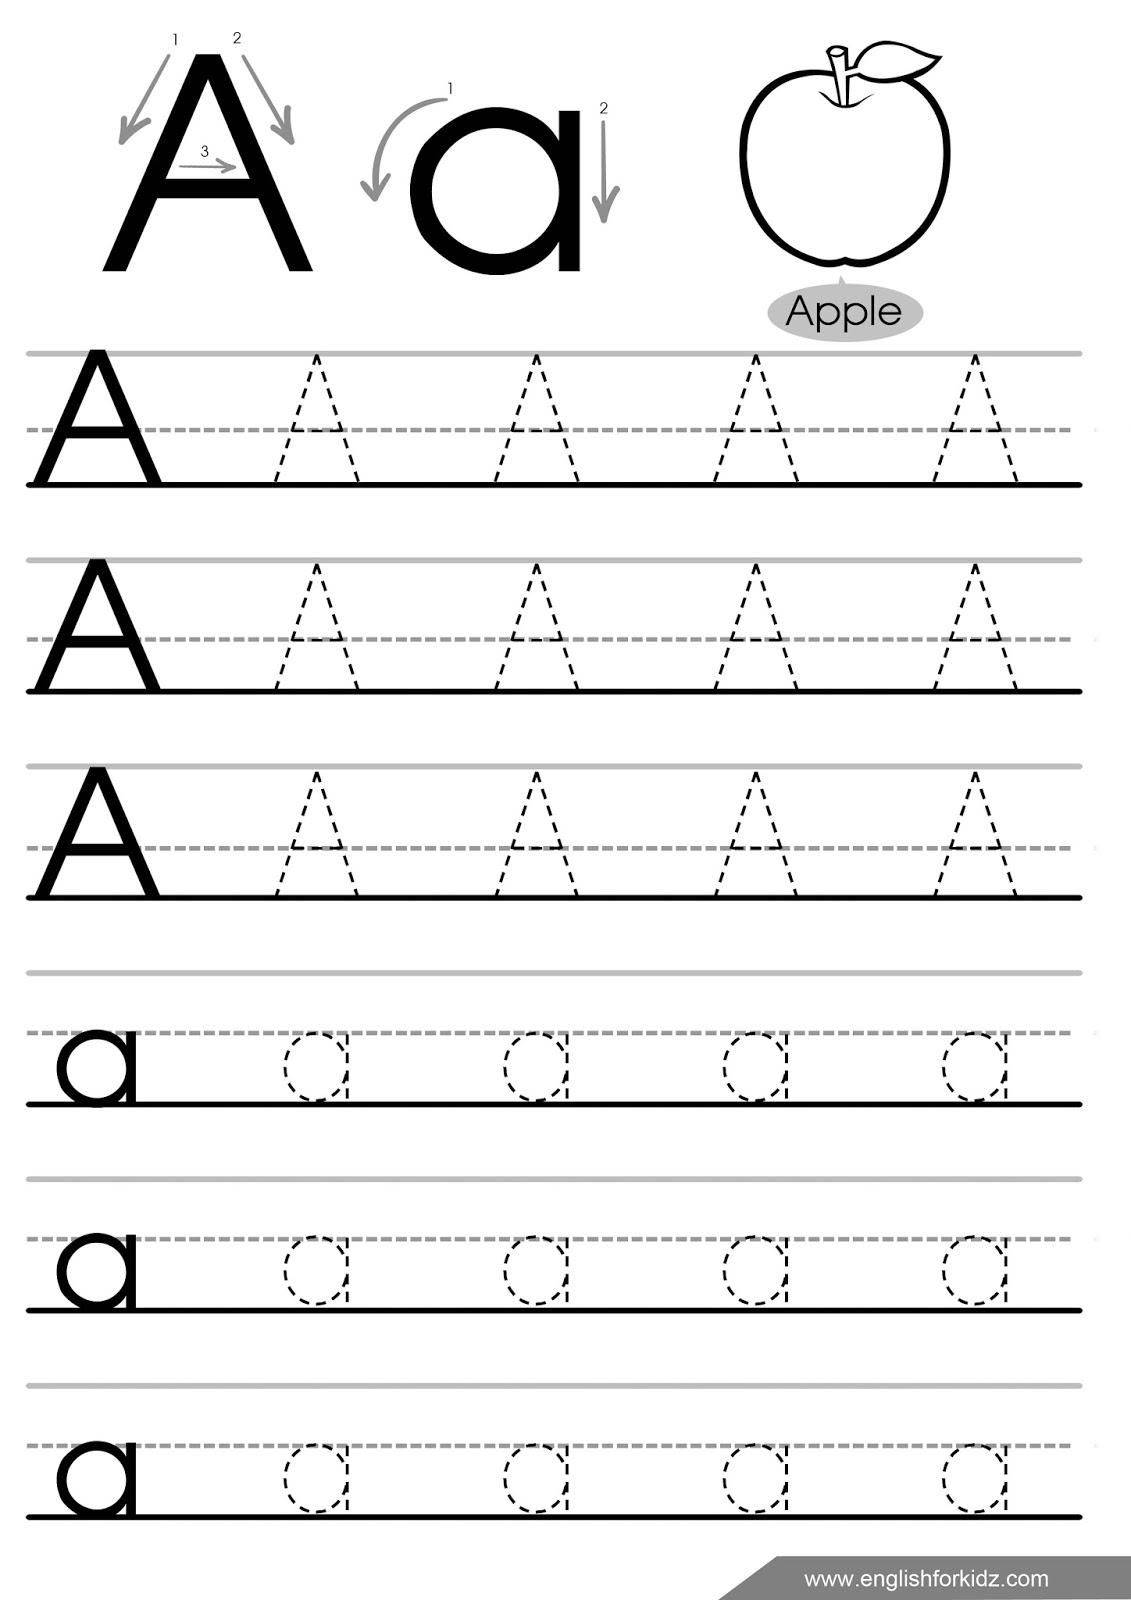 Preschool Worksheet For Letter A - Clover Hatunisi